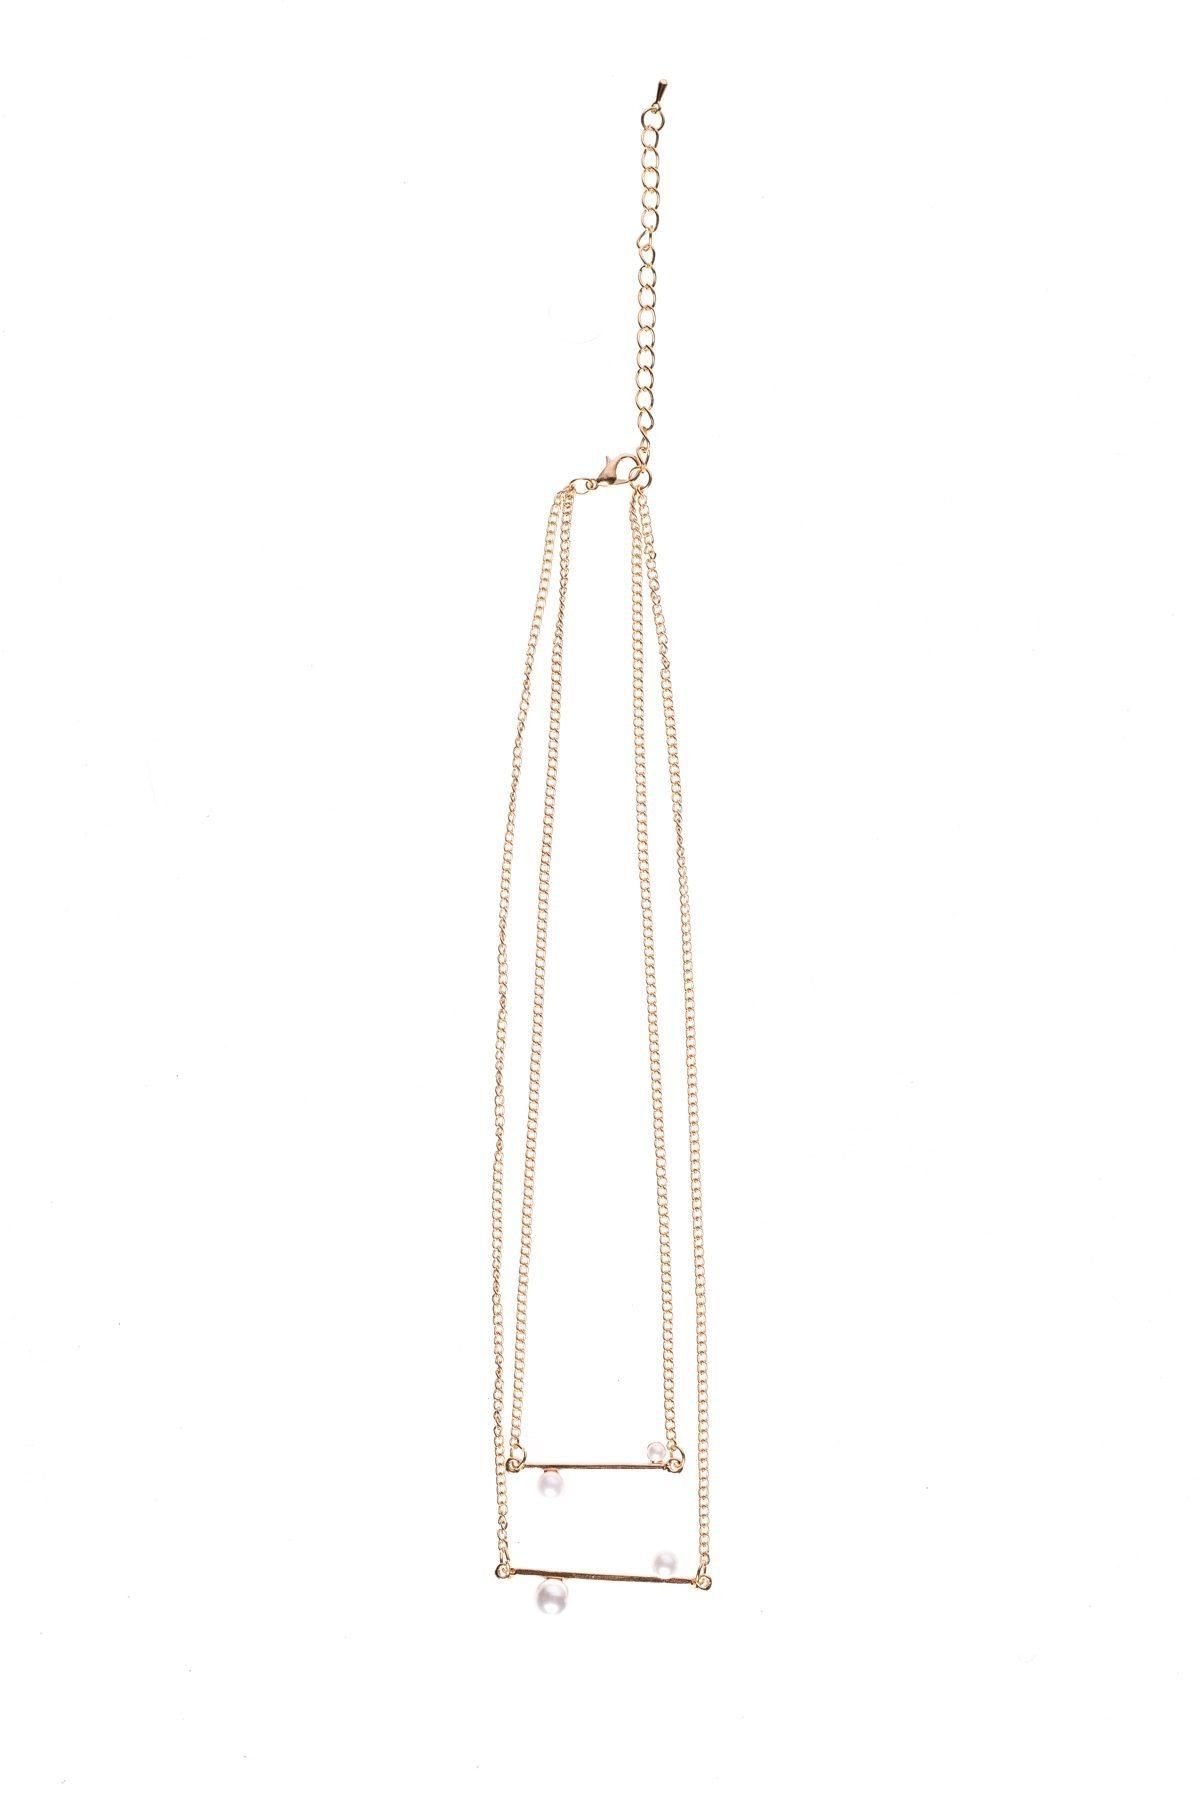 Colier cu lant si perle Auriu